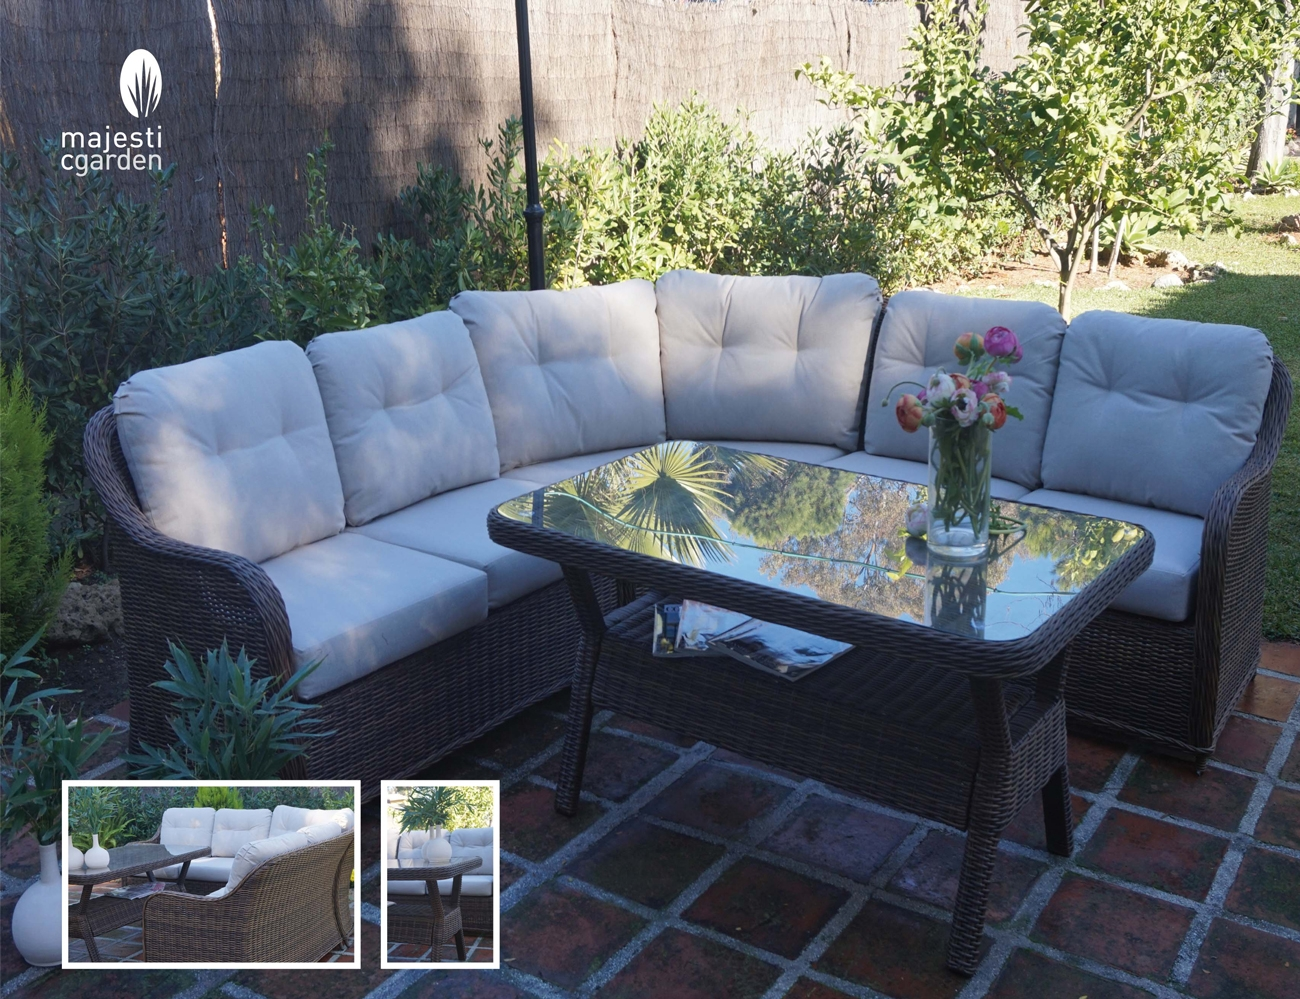 Set de sofá para exterior Algarve - Composición de muebles de jardín o terraza modelo ALGARVE de Majestic Garden